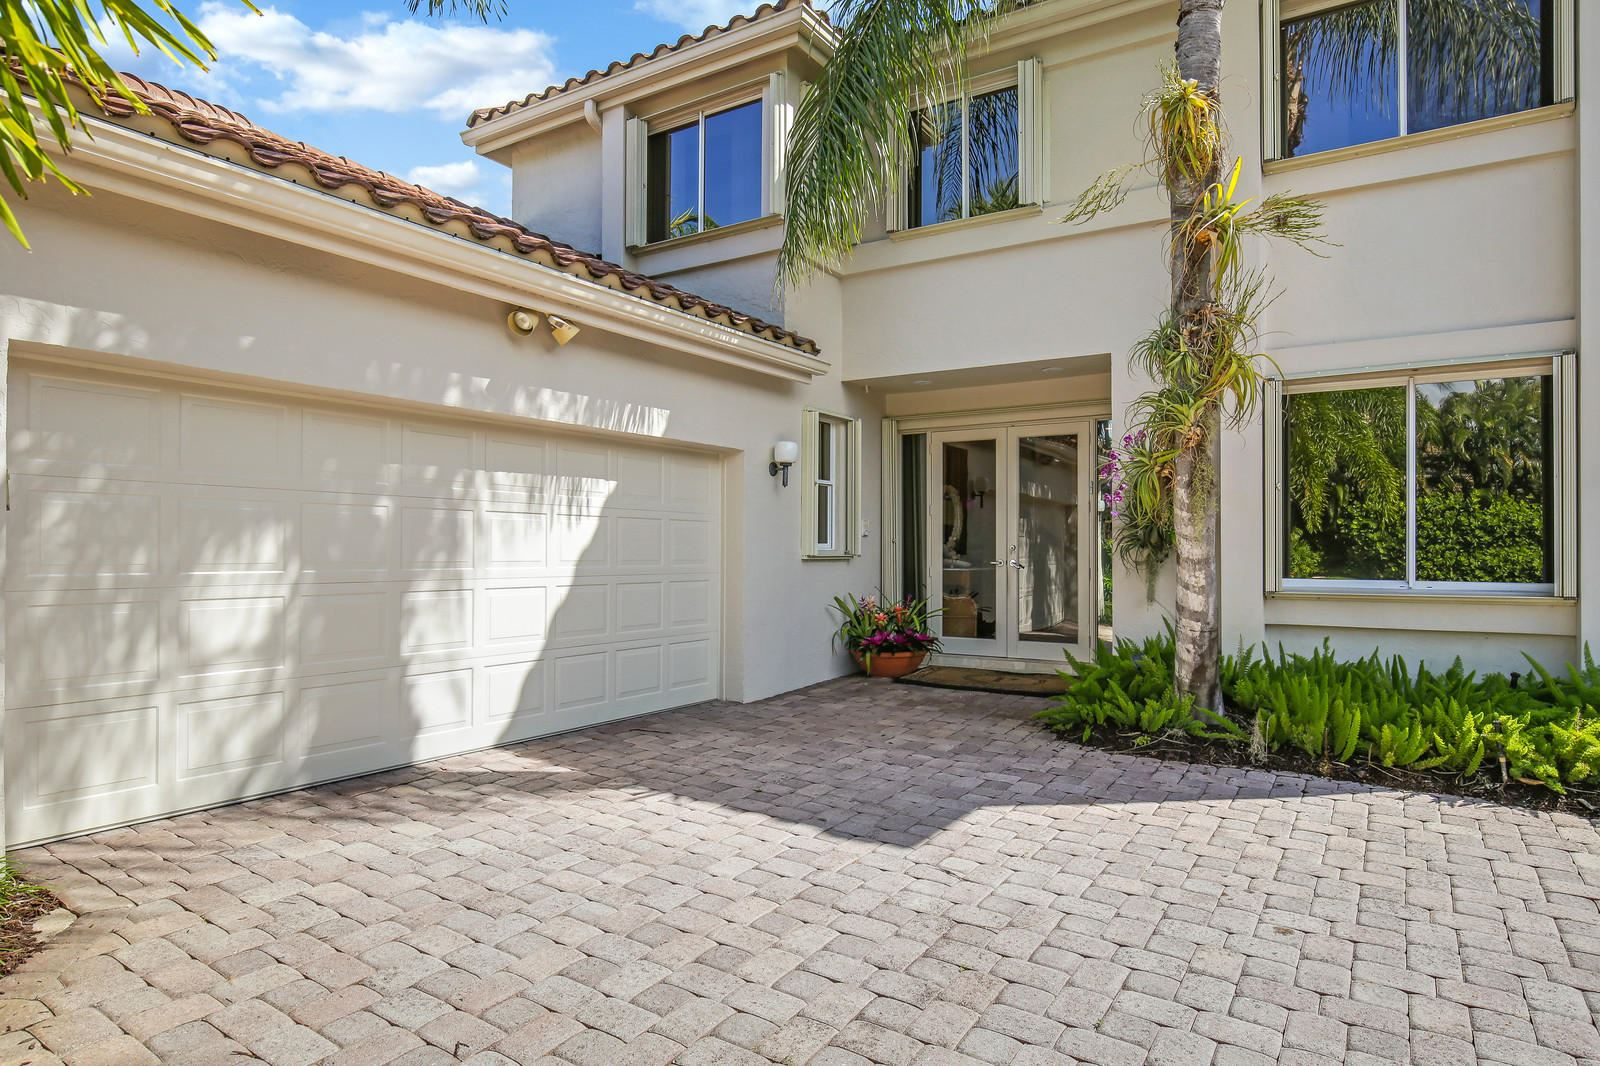 Photo of 3278 Degas Drive E, Palm Beach Gardens, FL 33410 (MLS # RX-10566552)